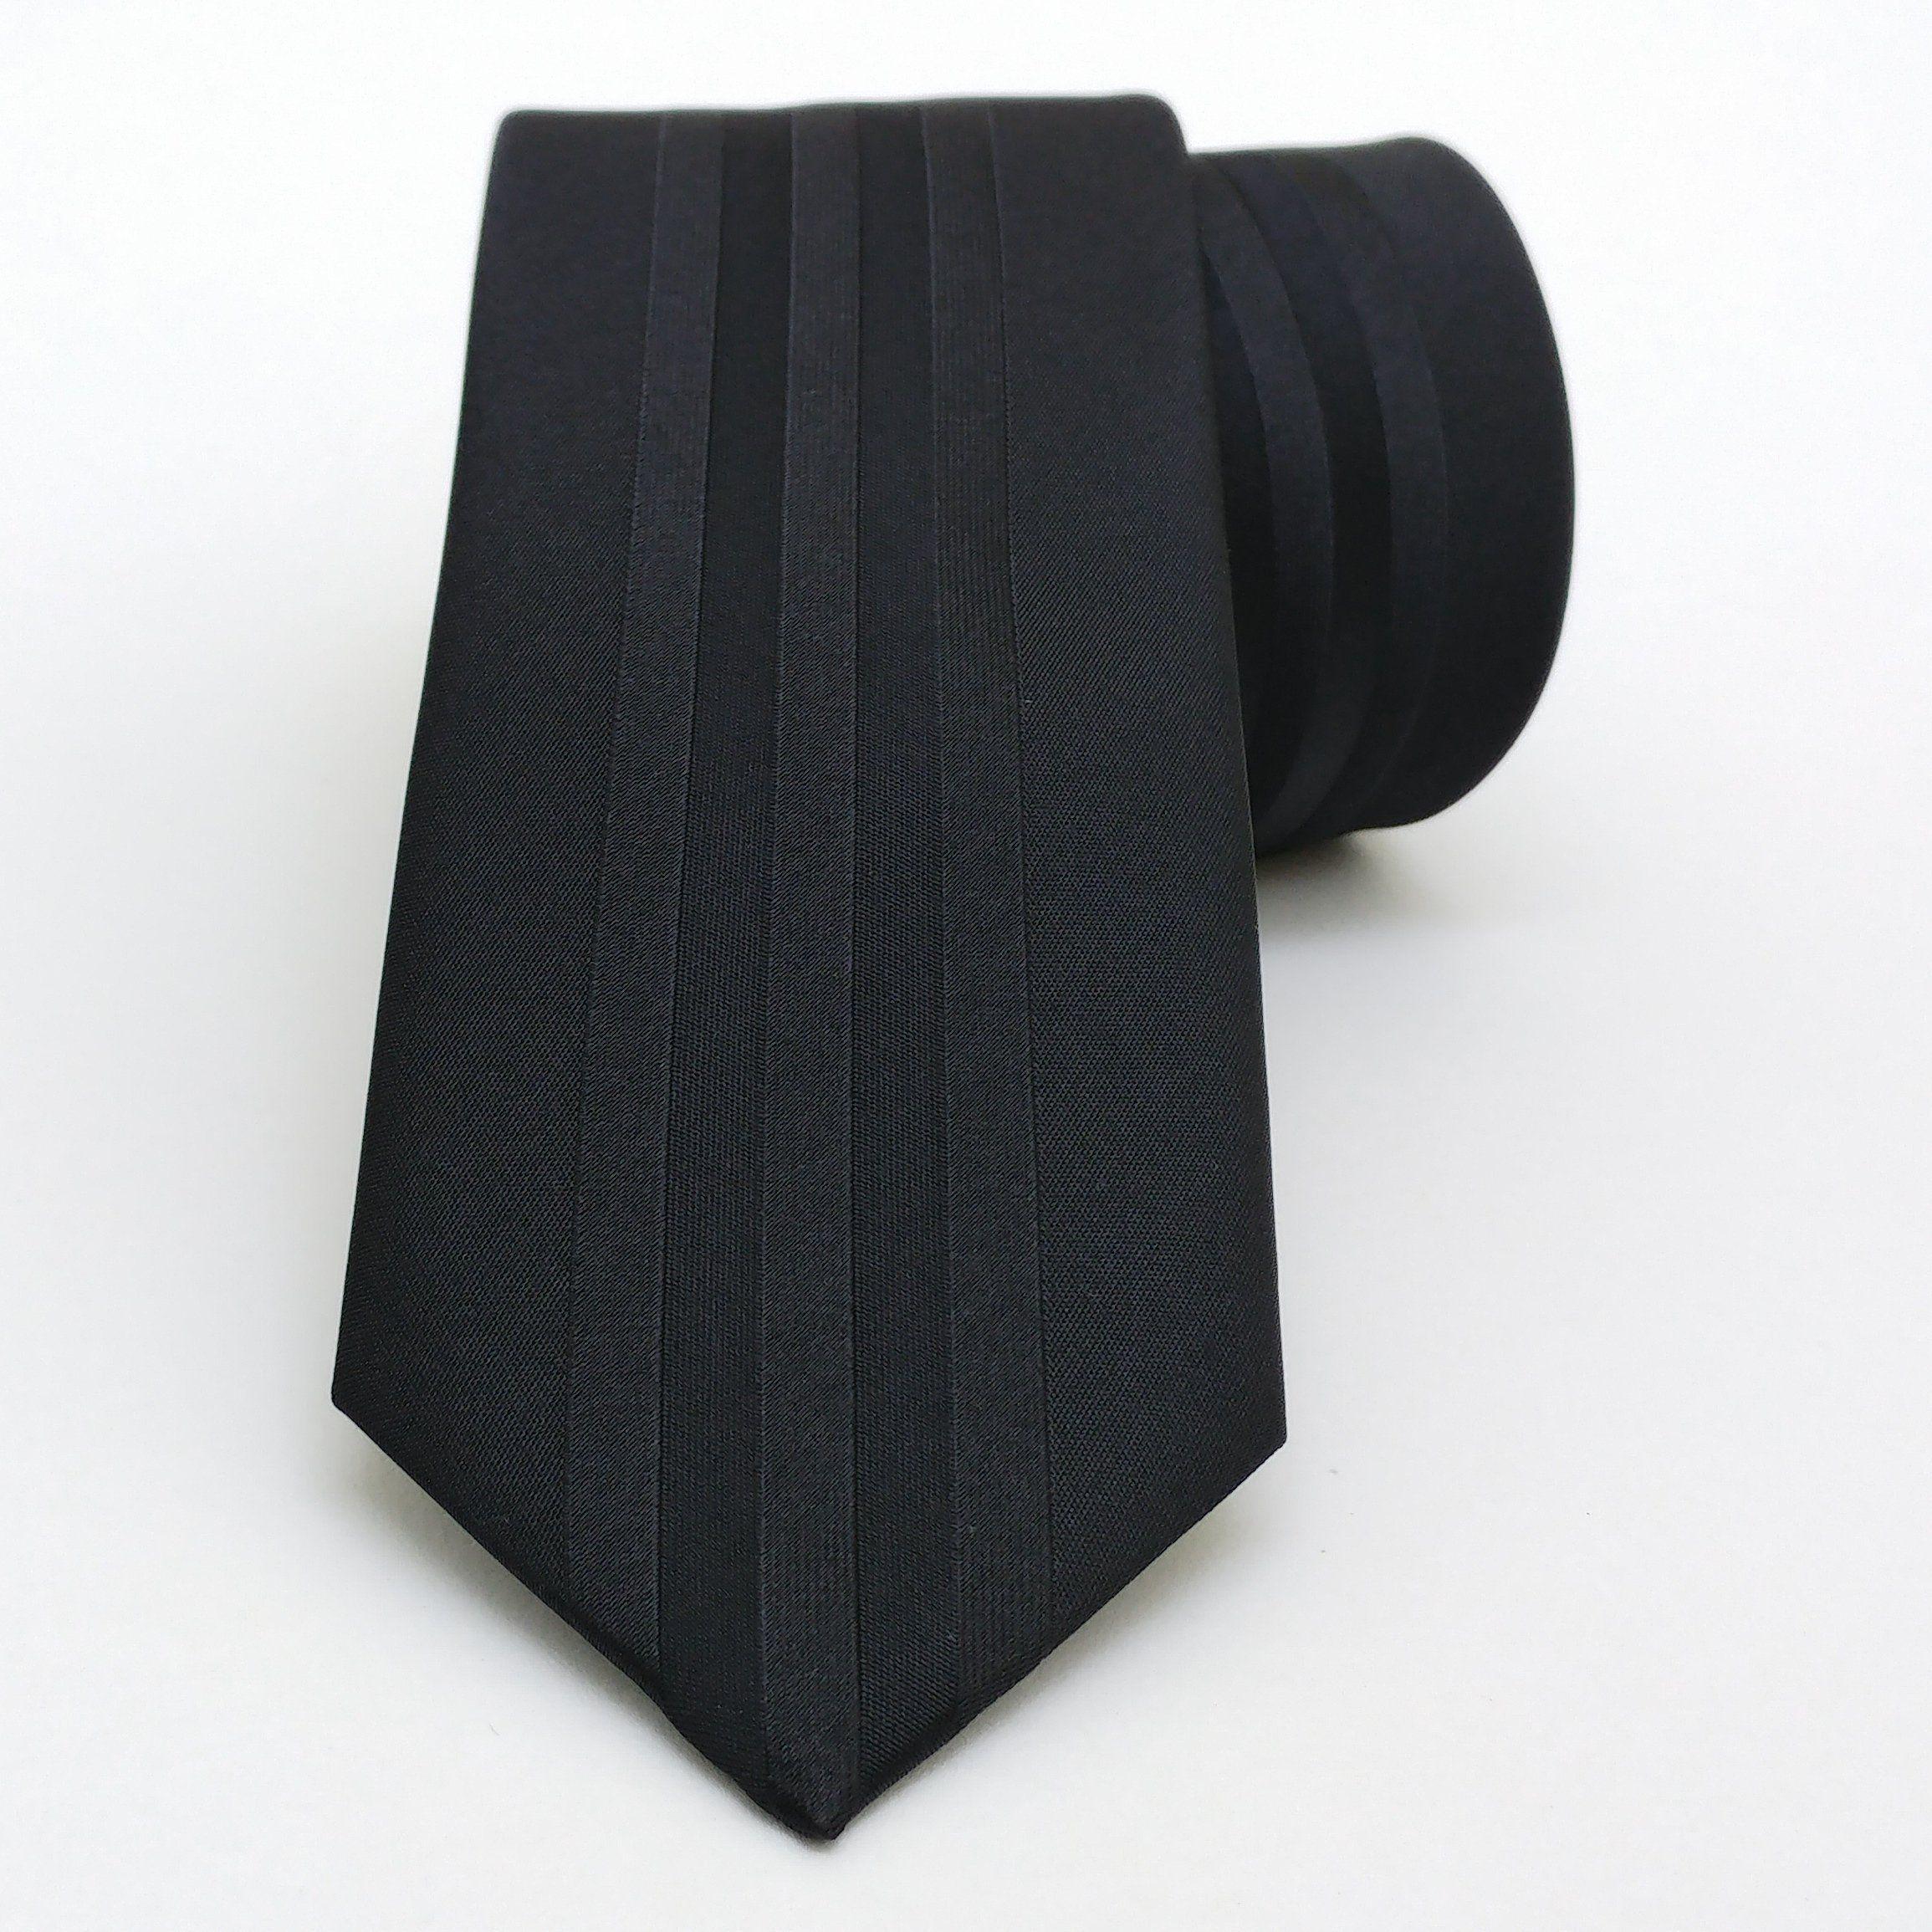 "Black striped men's tie 6 cm (2,36"") DK-210. Black striped men's necktie DK-210 Width : 6 cm (2,36"") Length : 150 cm (59,06"")."